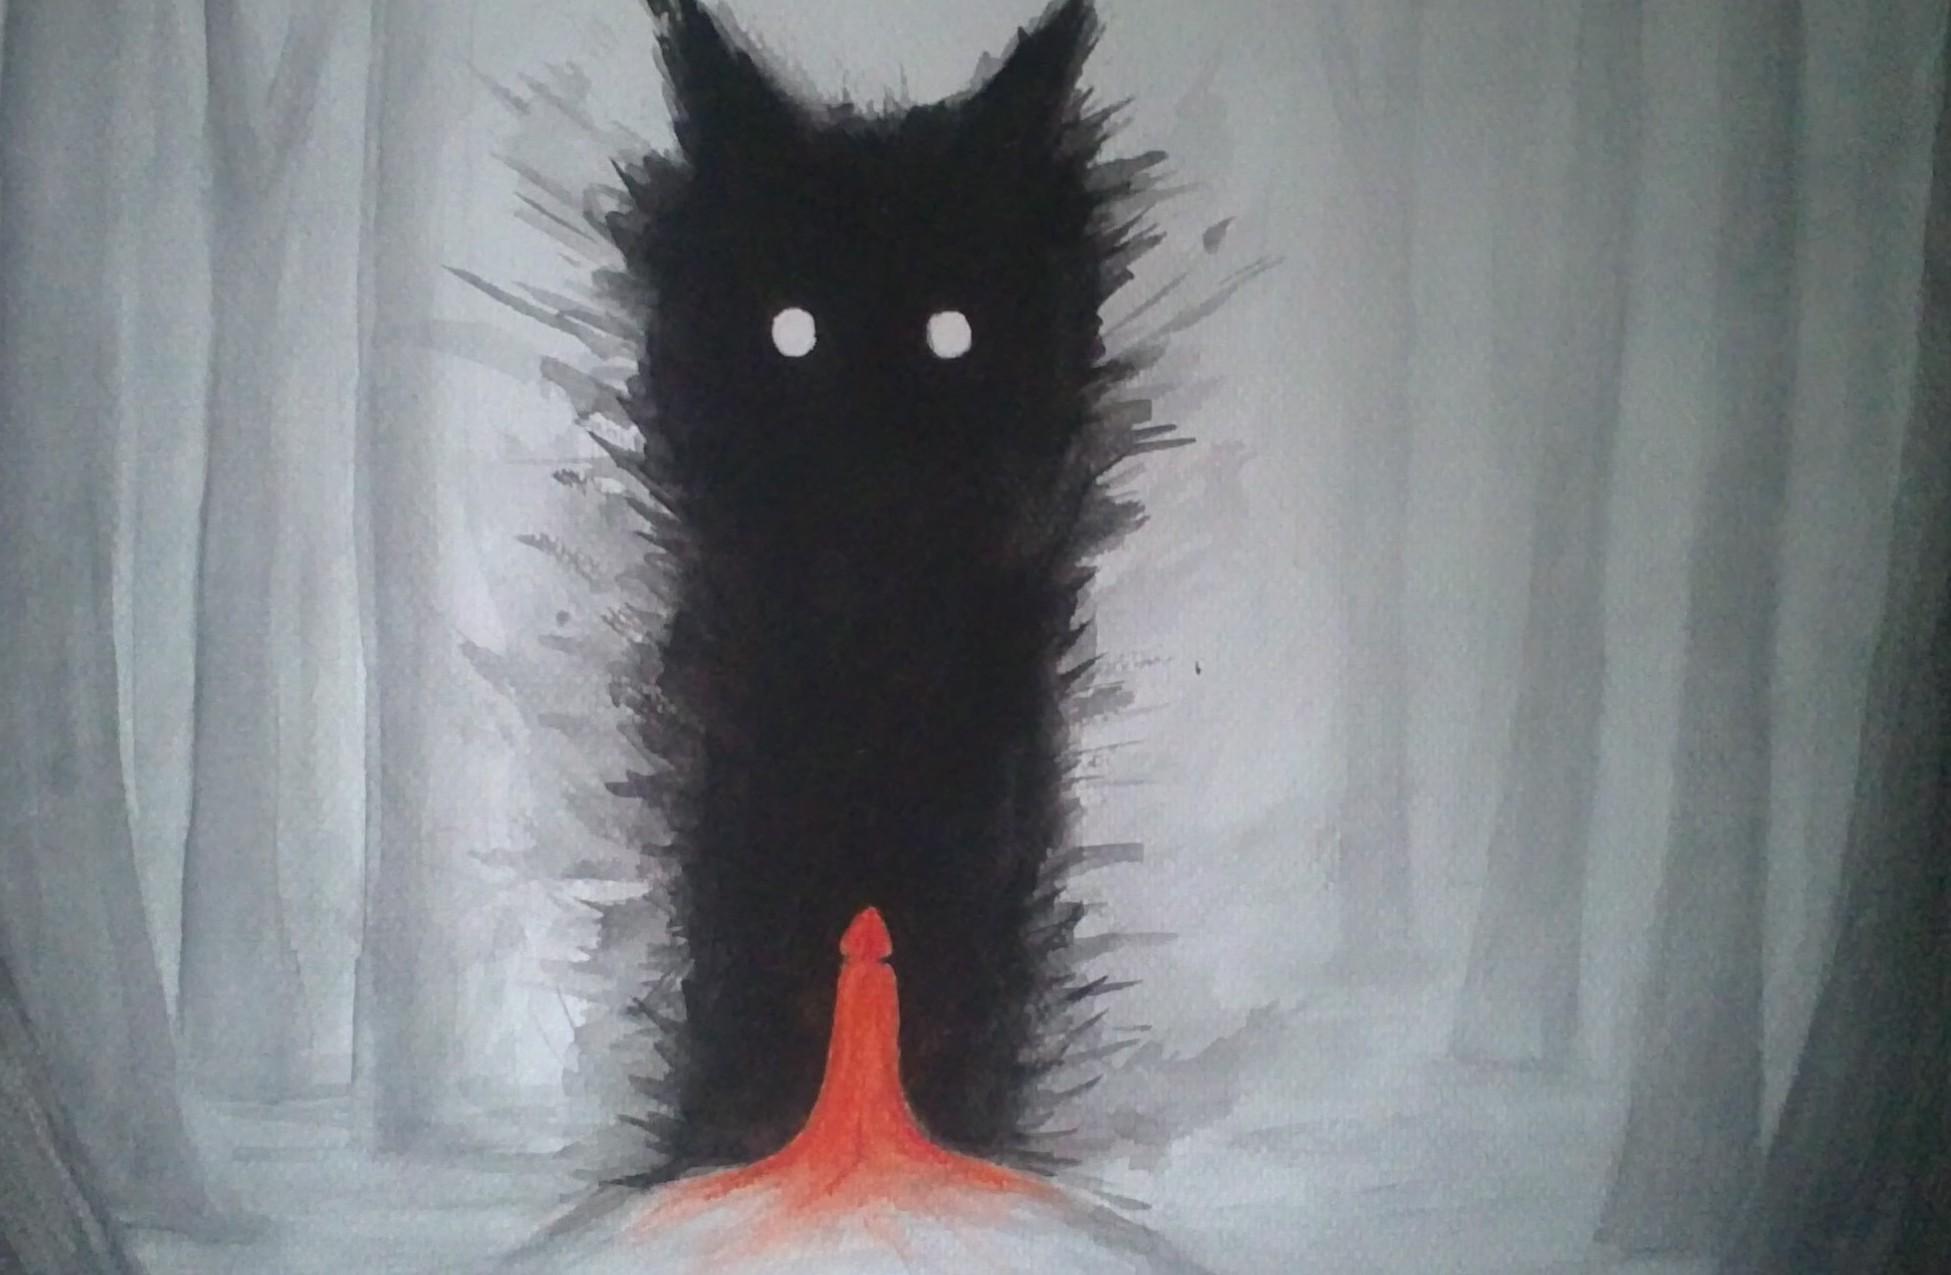 Červená Karkulka (BlackBird)